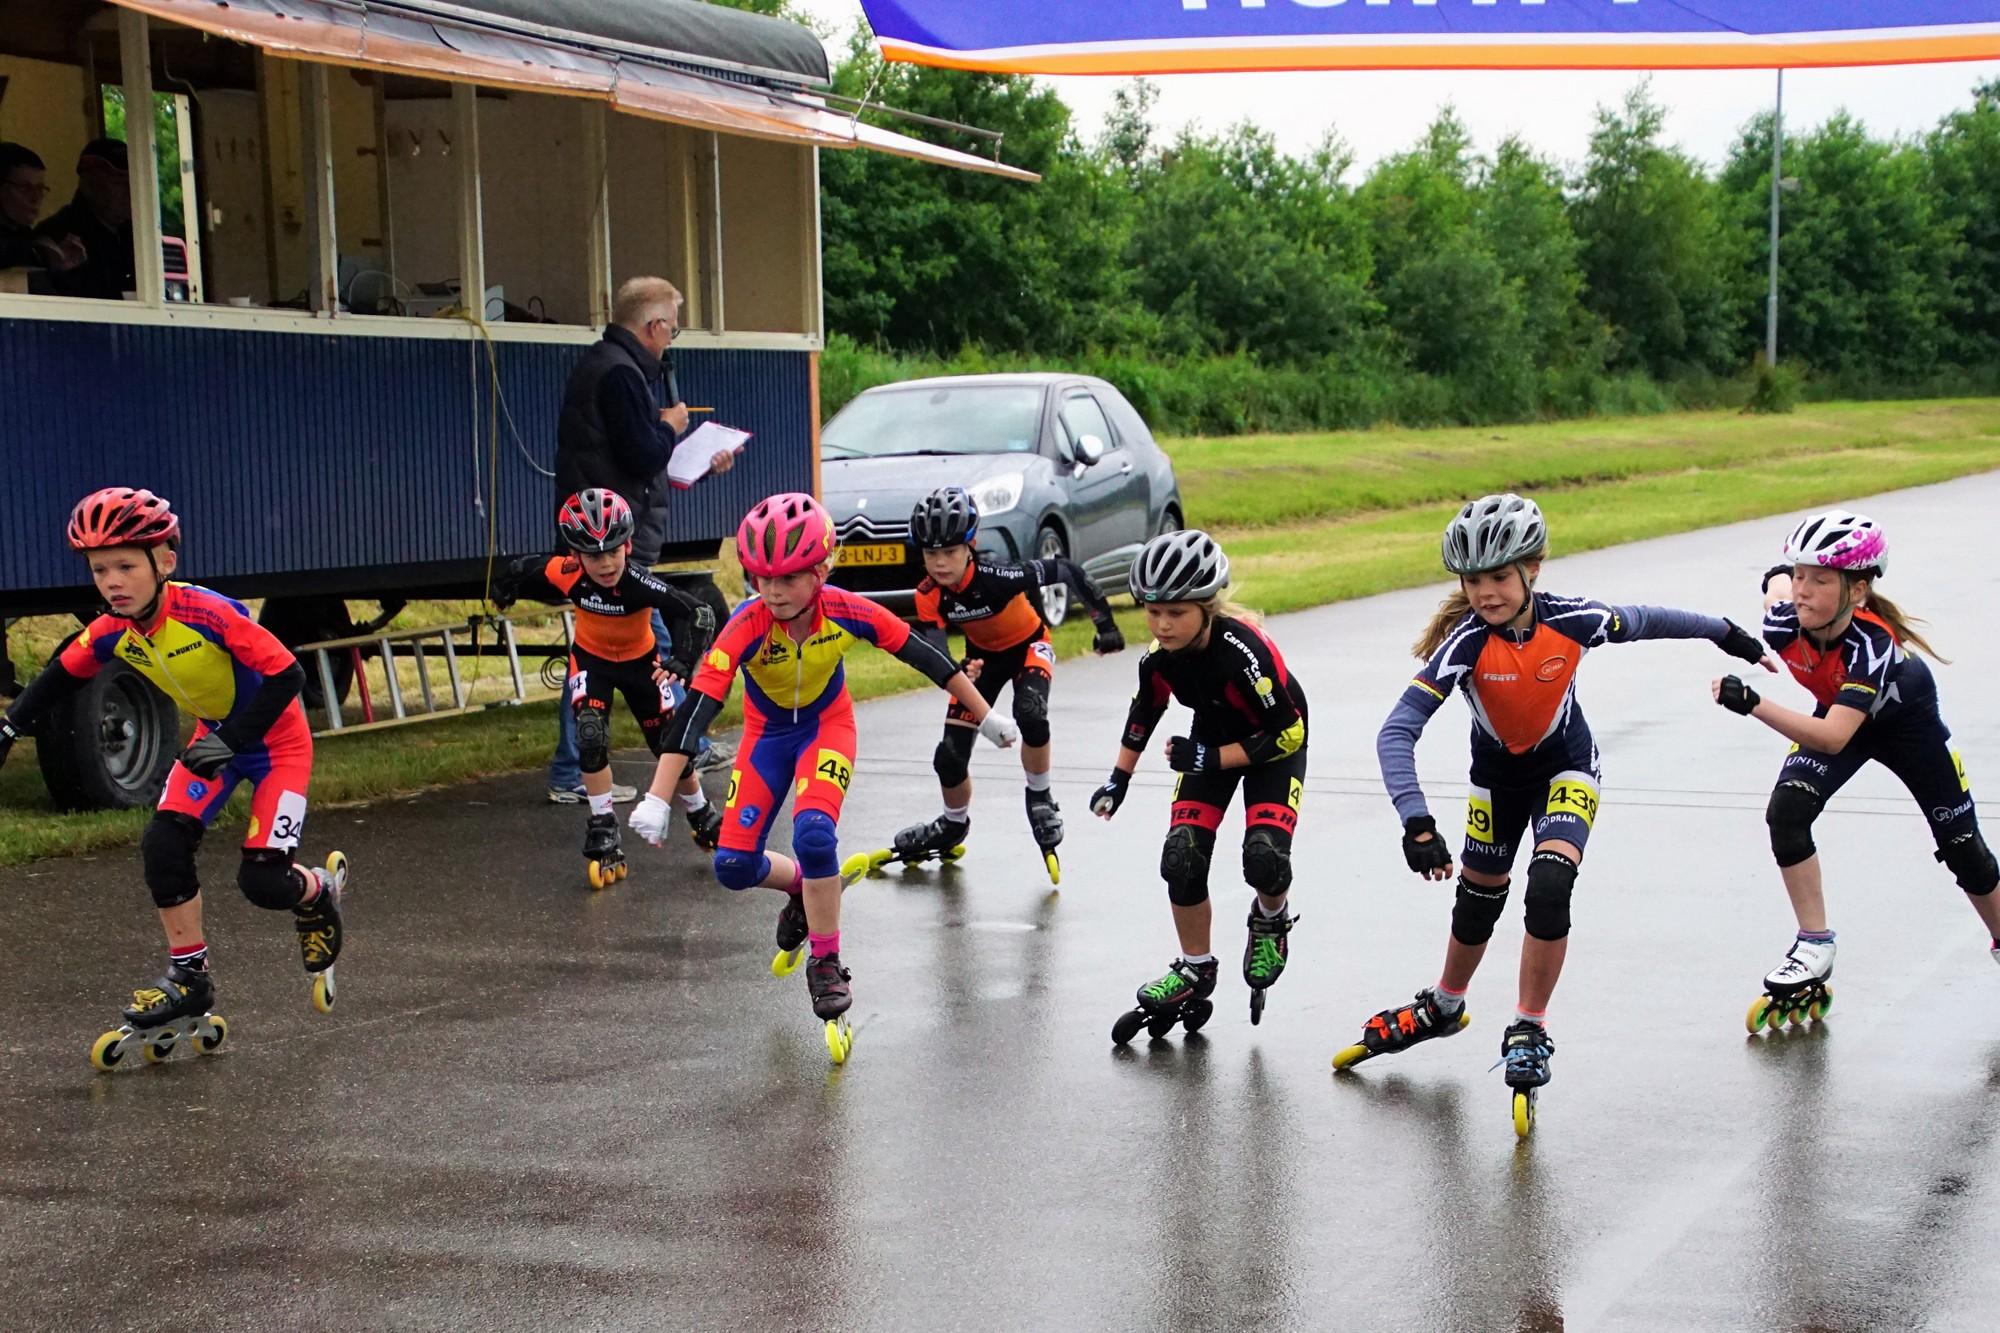 4e0db1599dc Powerslide Inline Competitie in Surhuisterveen - 8karspelennieuws ...